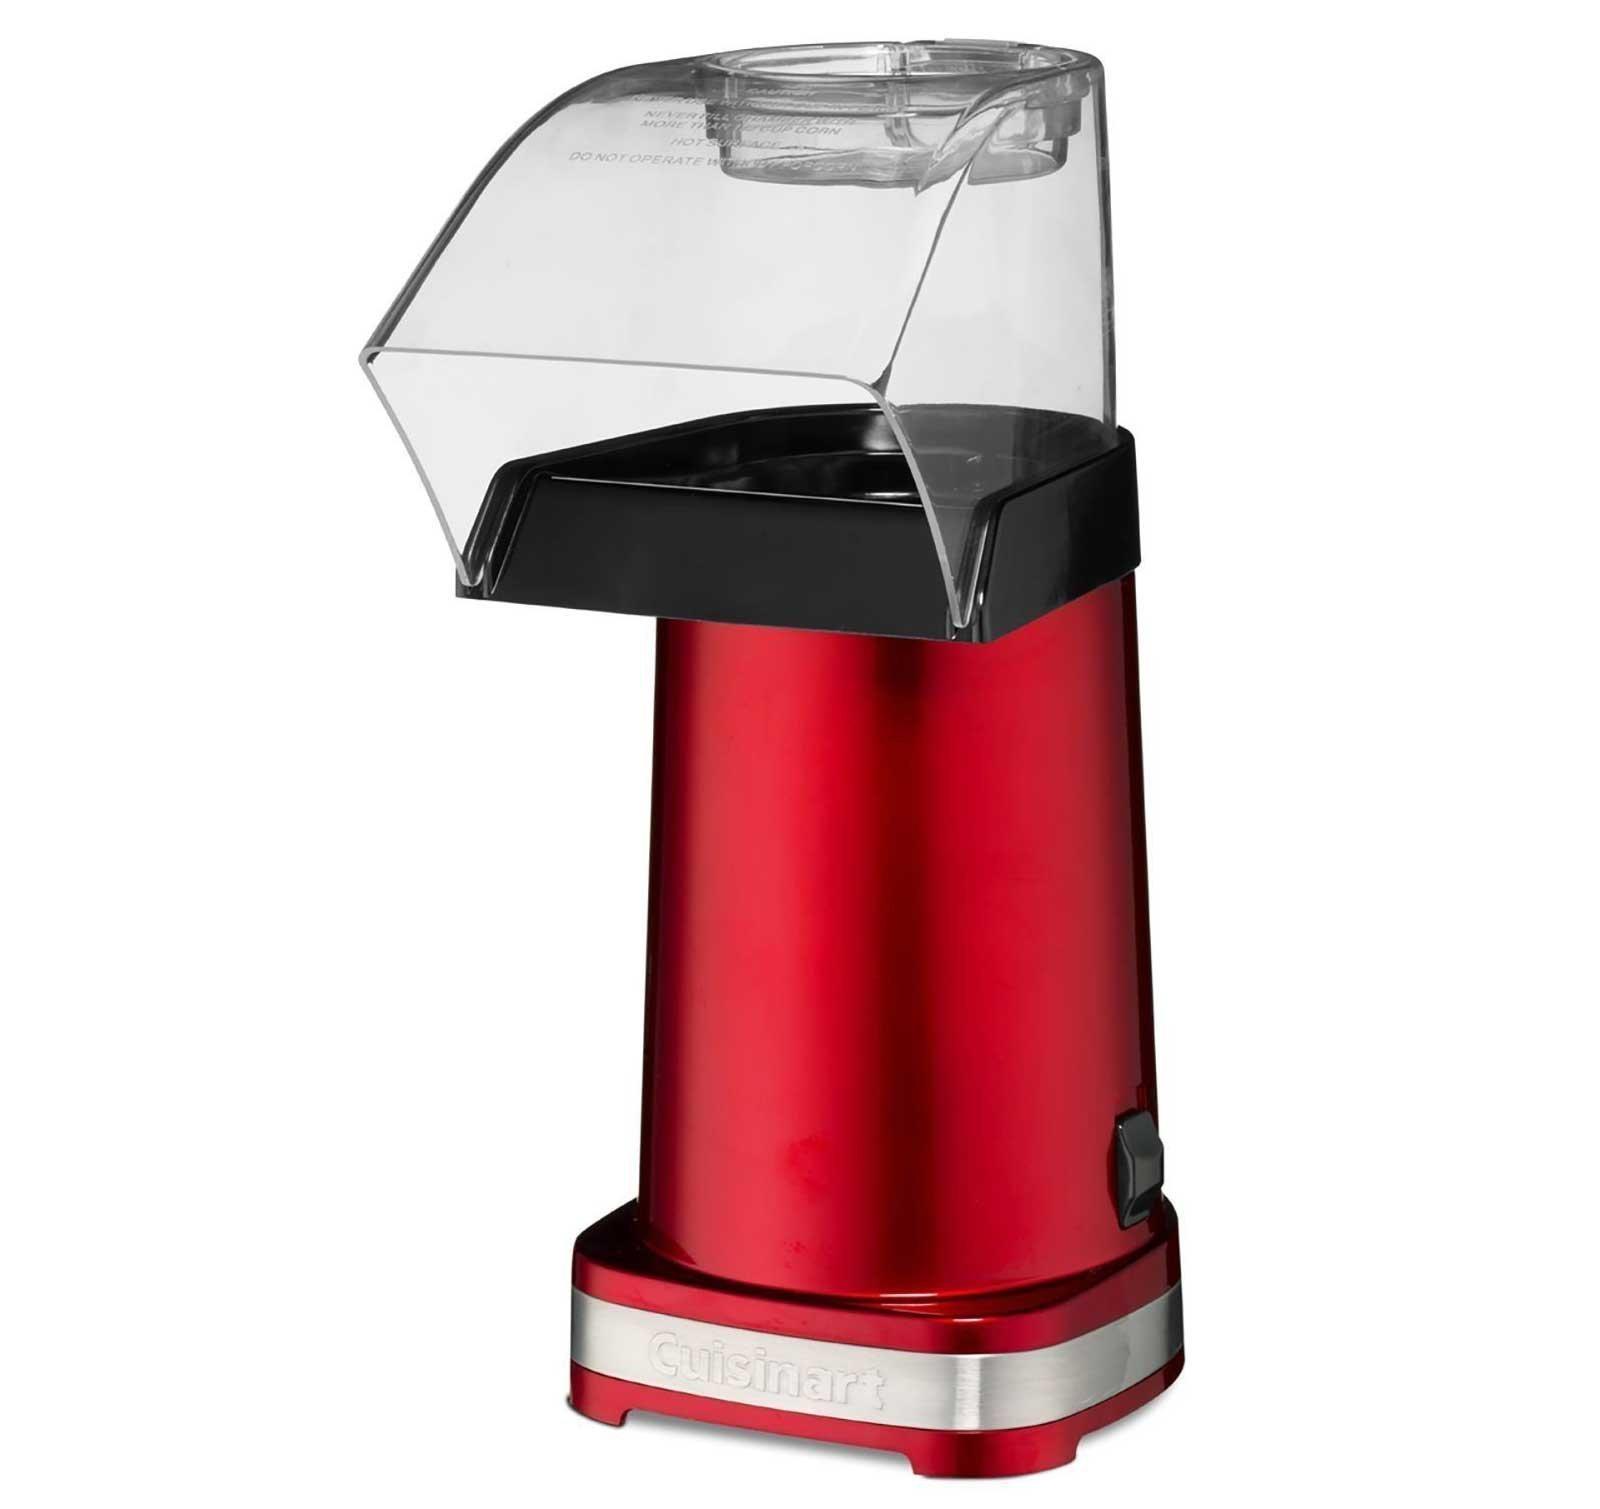 Cuisinart EasyPop Hot Air Popcorn Maker (Red) (Certified Refurbished)